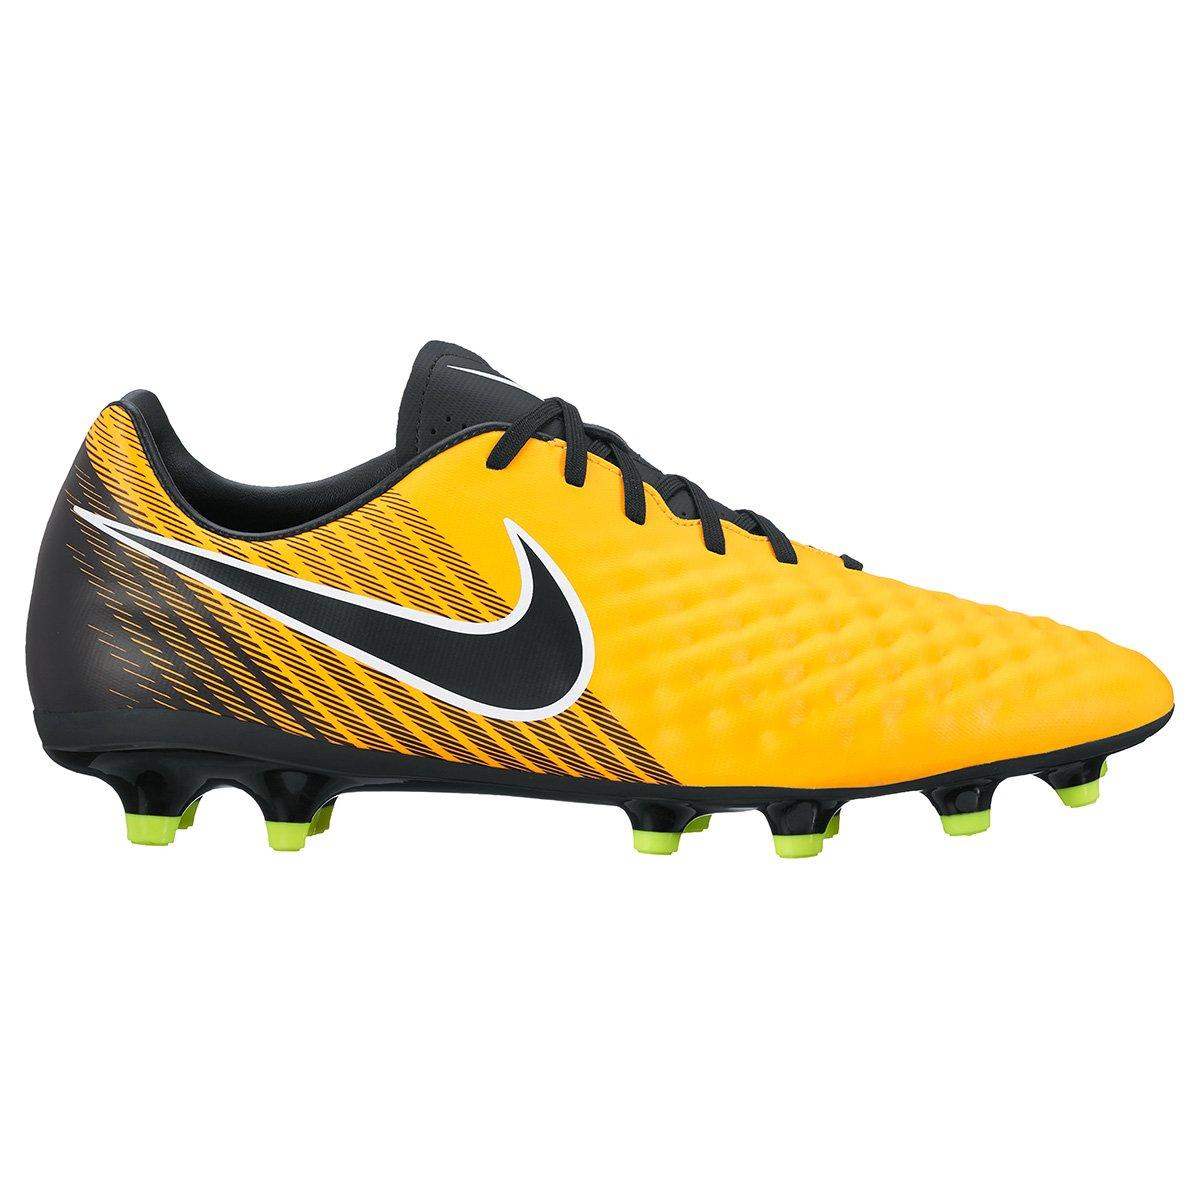 Chuteira Campo Nike Magista Onda II FG - Compre Agora  0417cf9ab07db